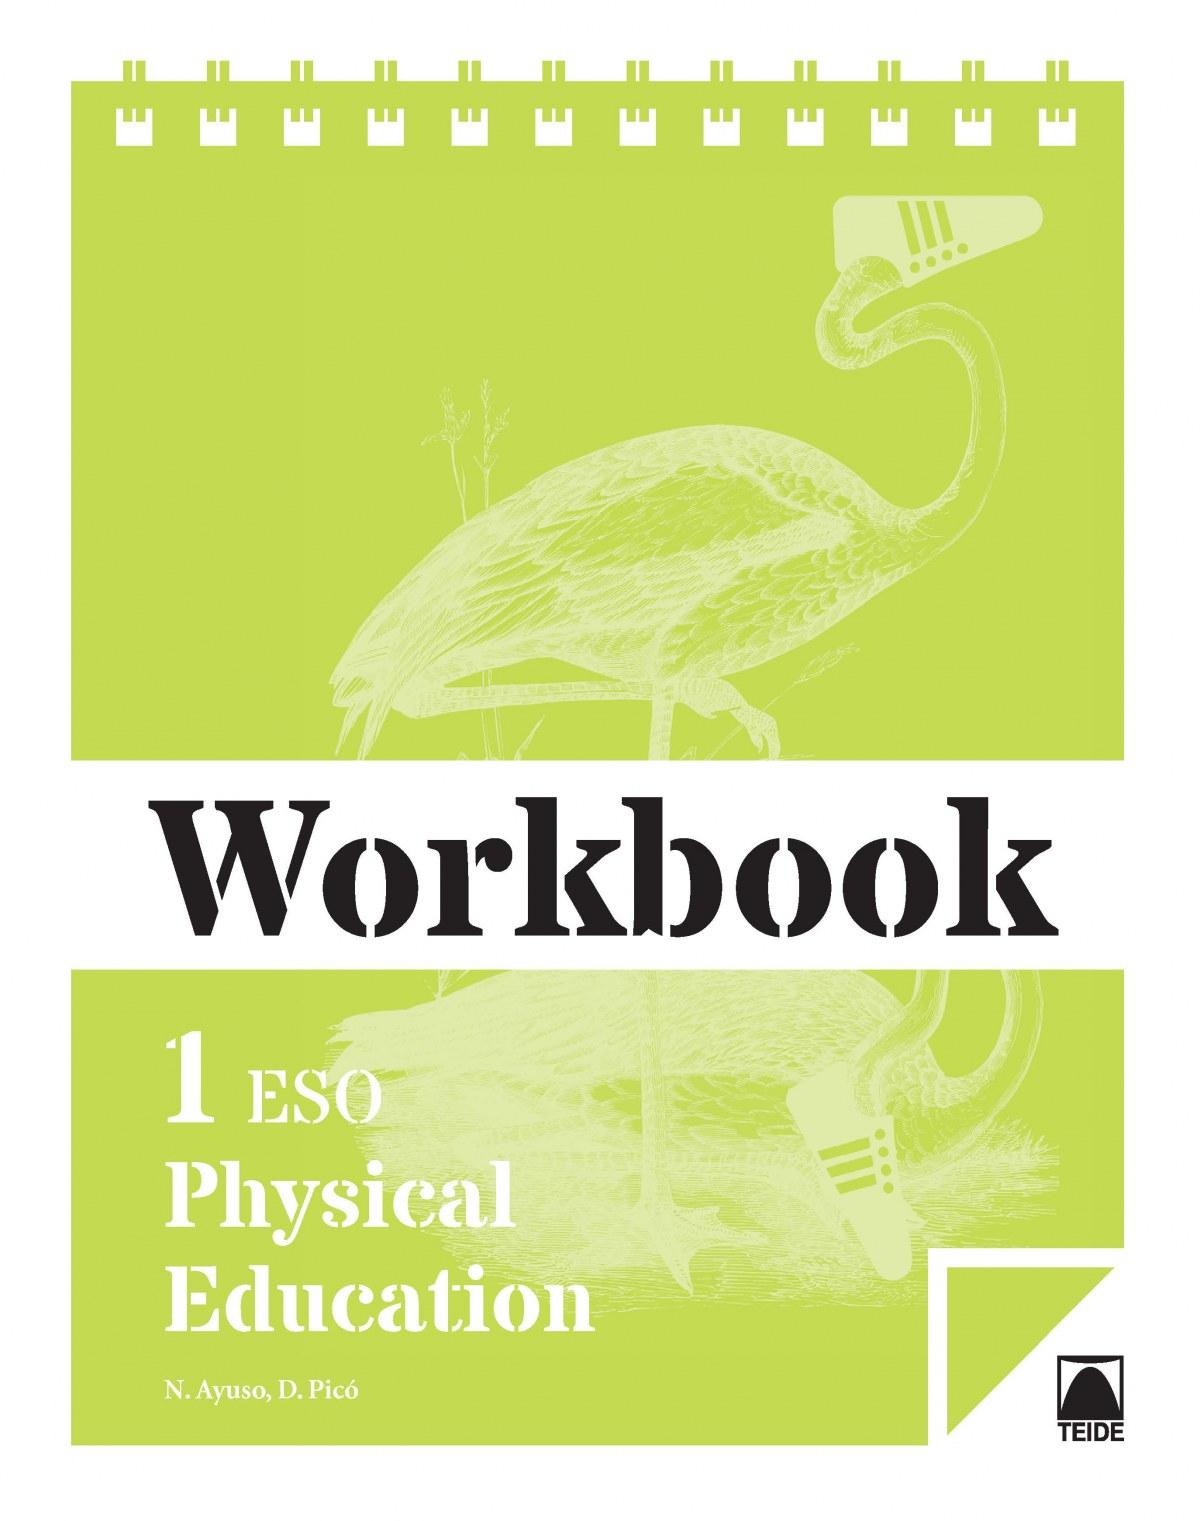 (15).PHYSICAL EDUCATION 1ºESO.(WORKBOOK)